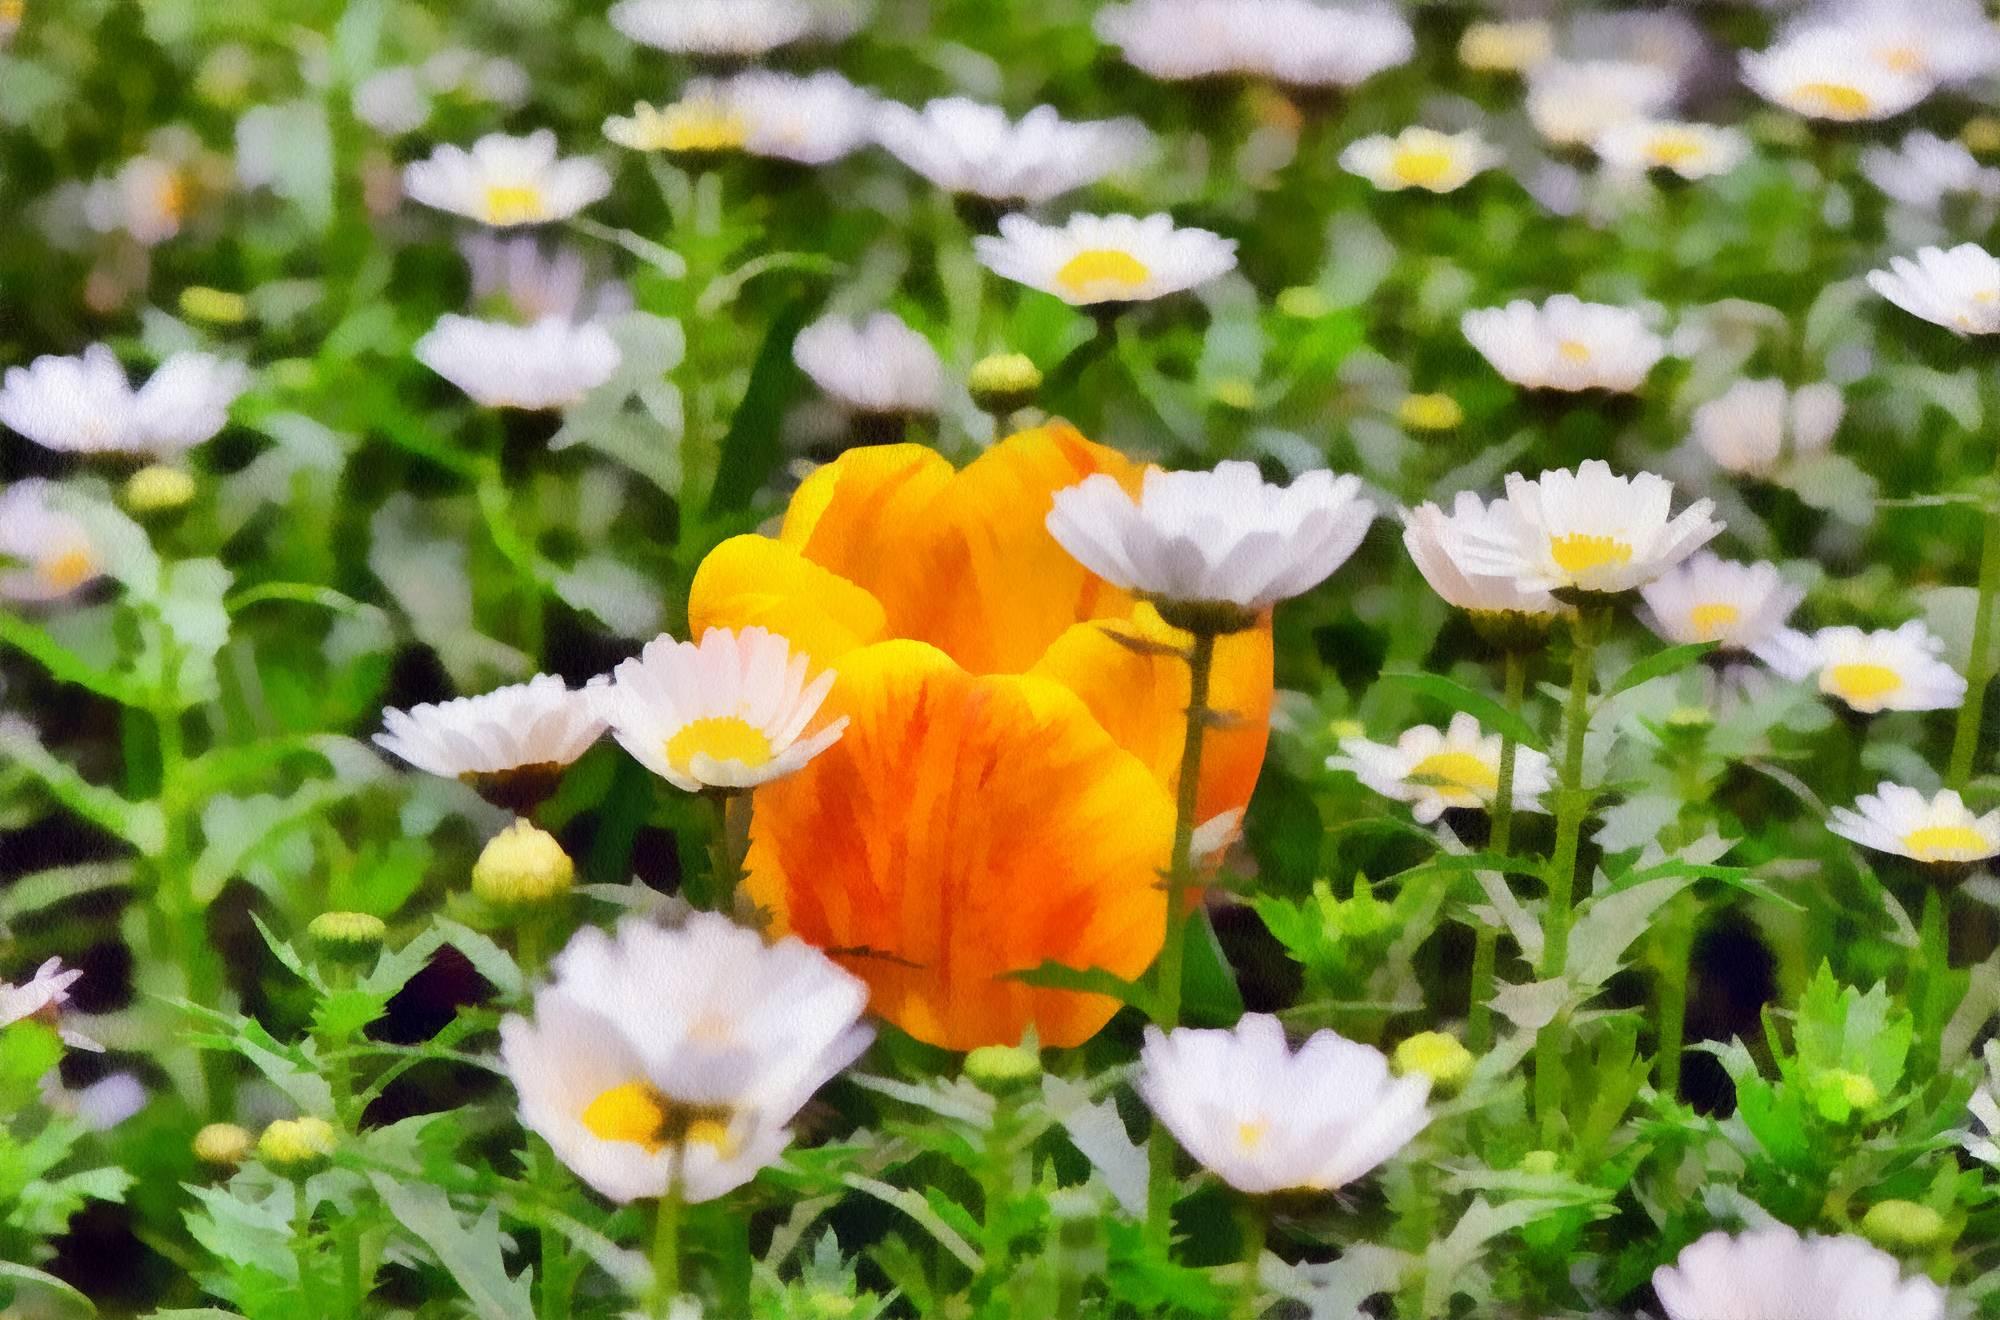 tulip-013 - Watercolor Flower Painting for Sale - Digital ...